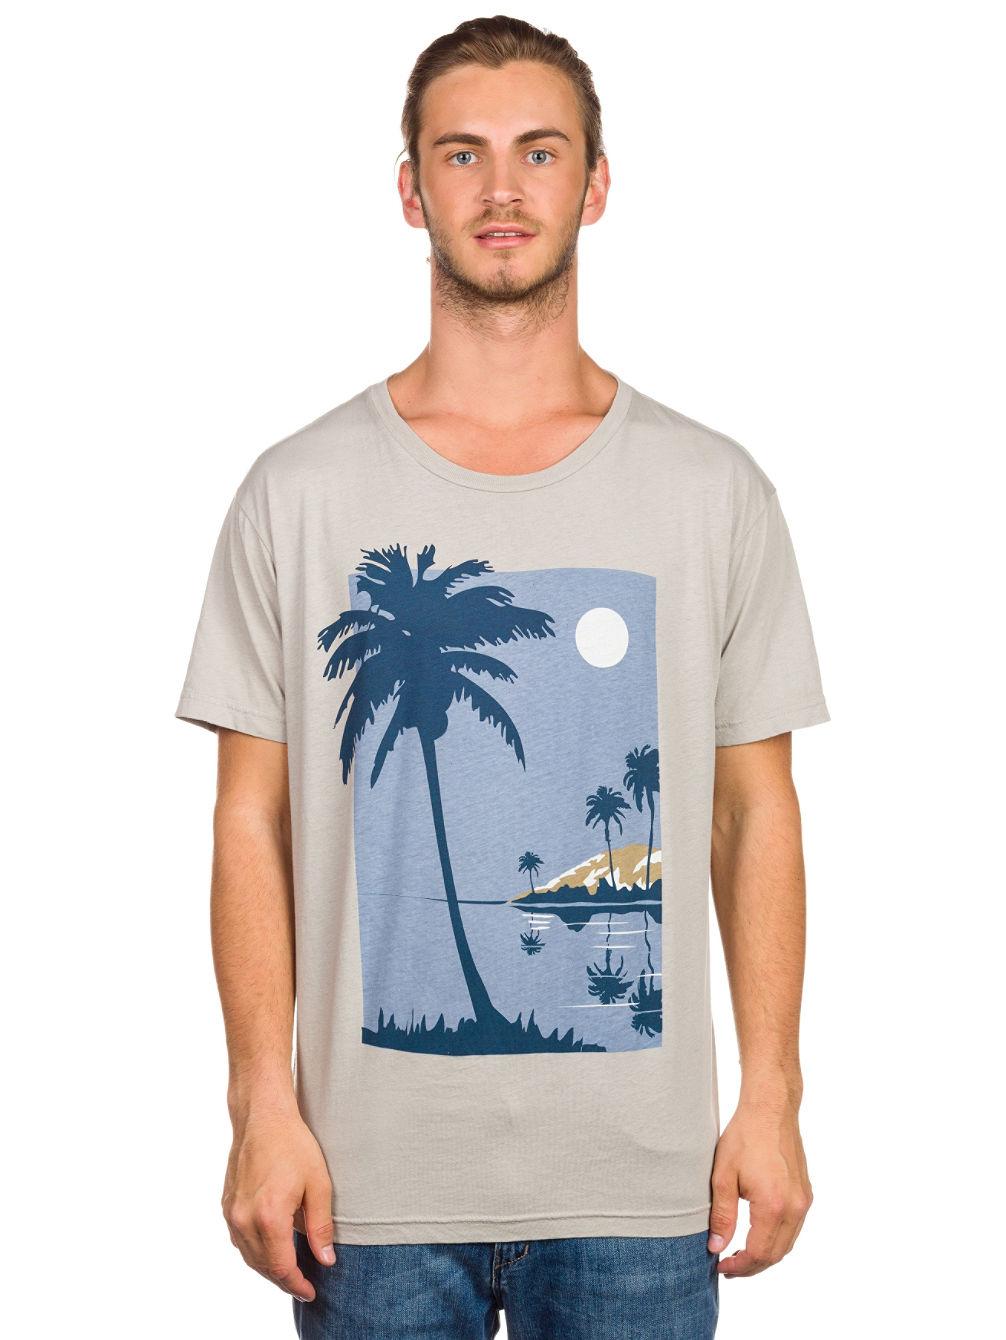 freedom-artists-full-moon-t-shirt